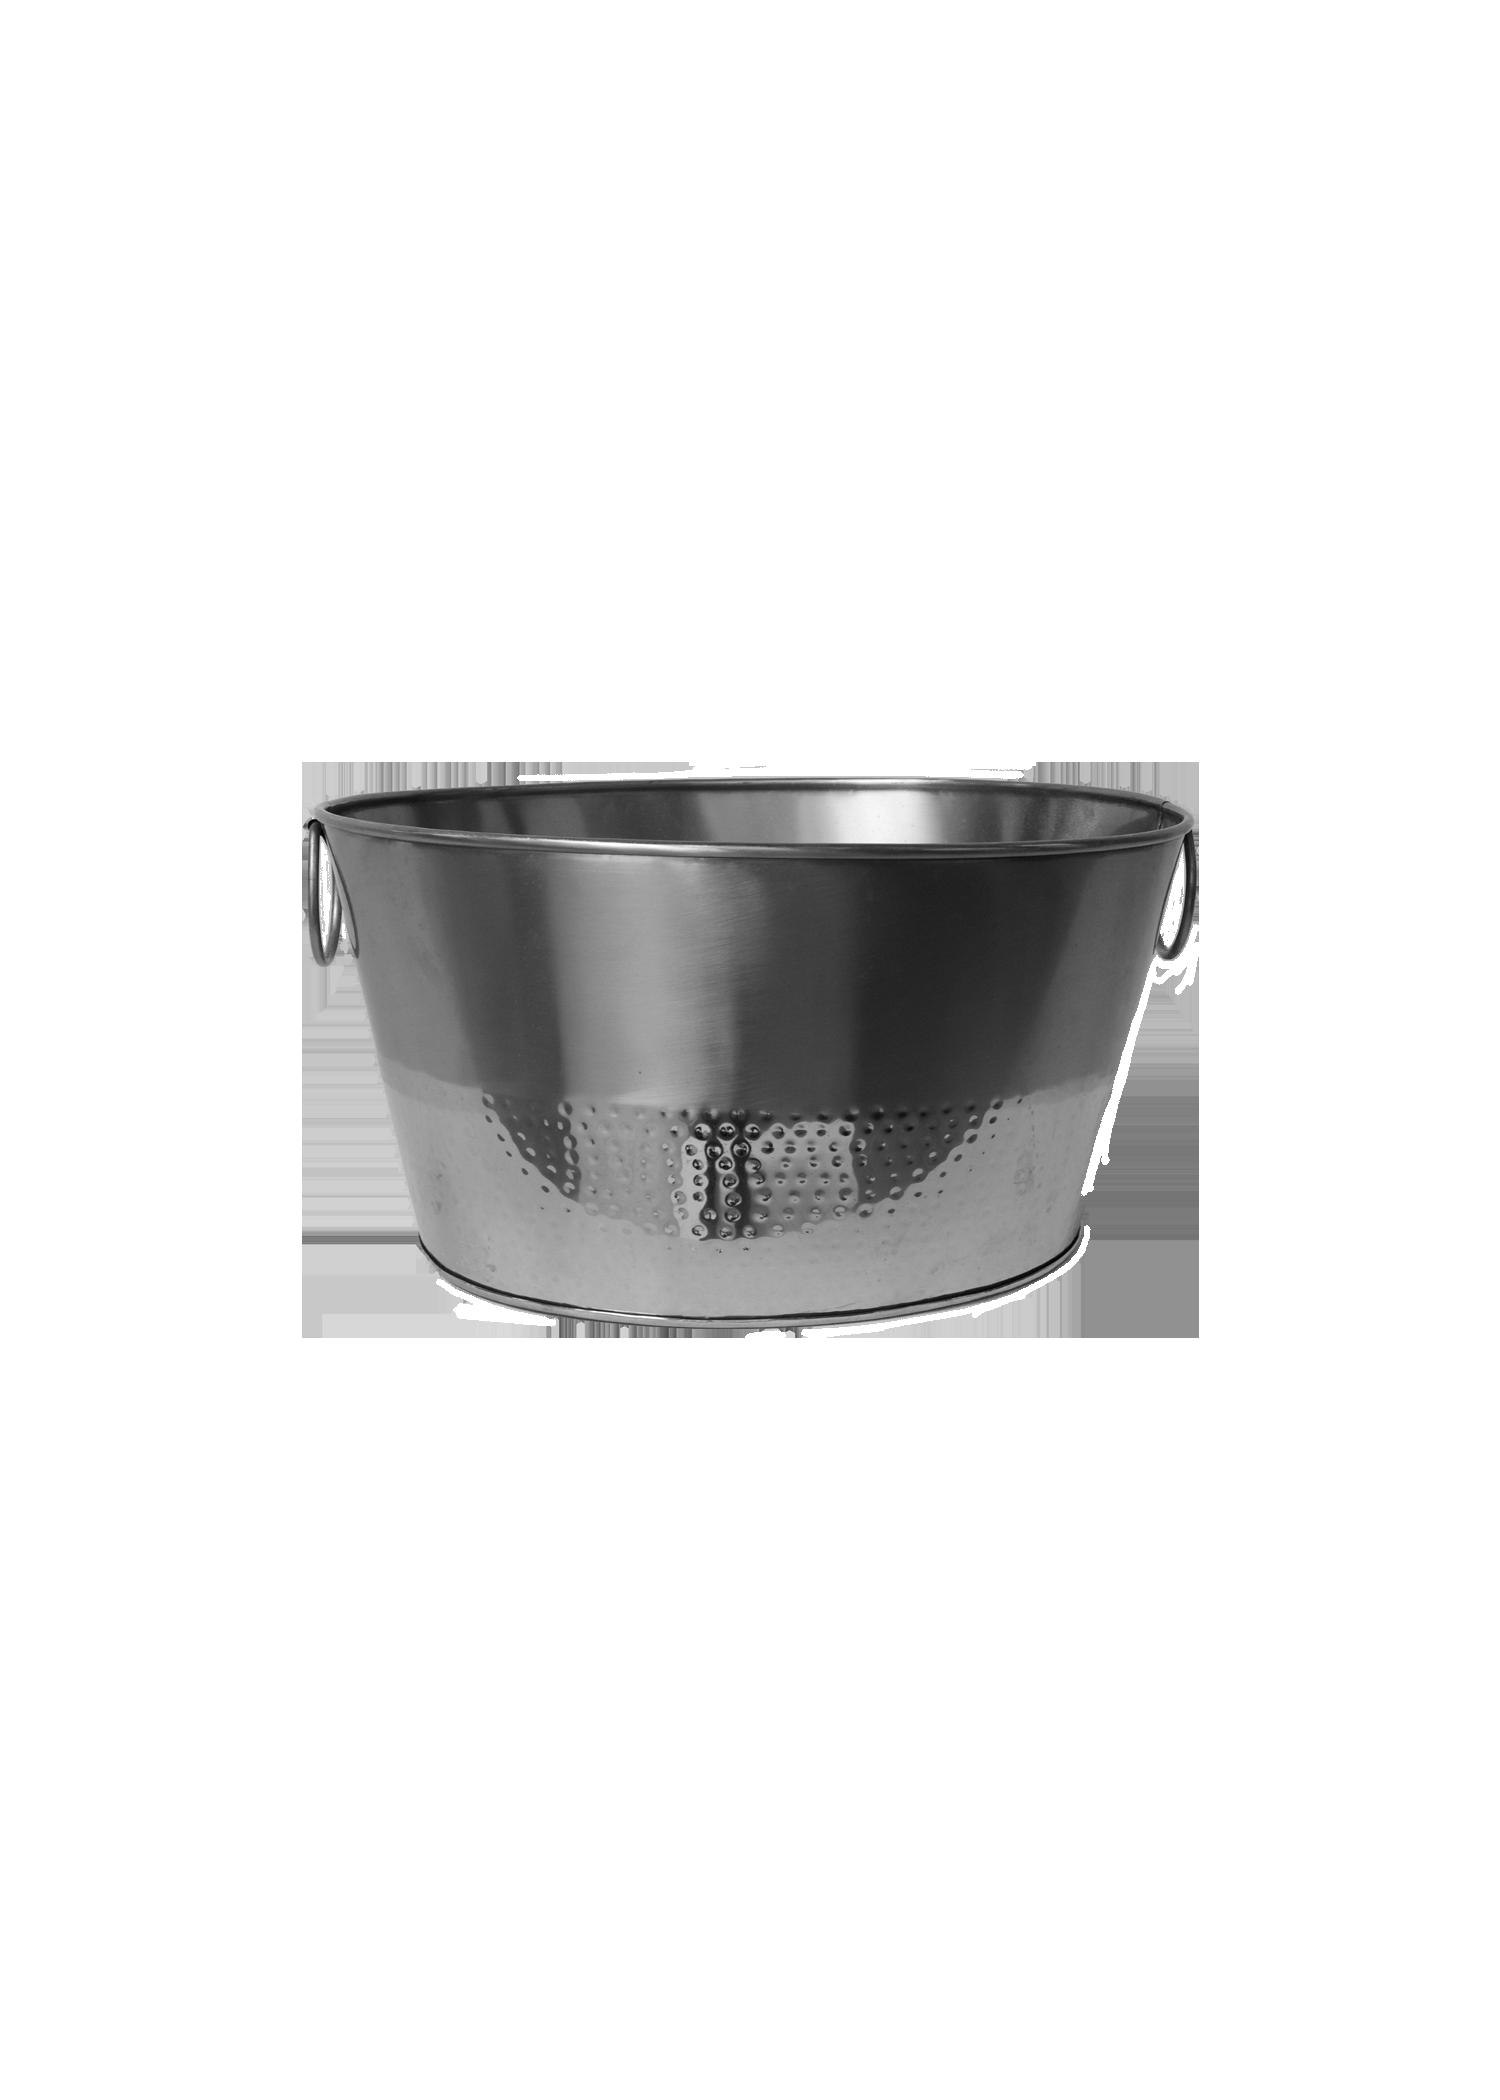 Small Galvanized Tub